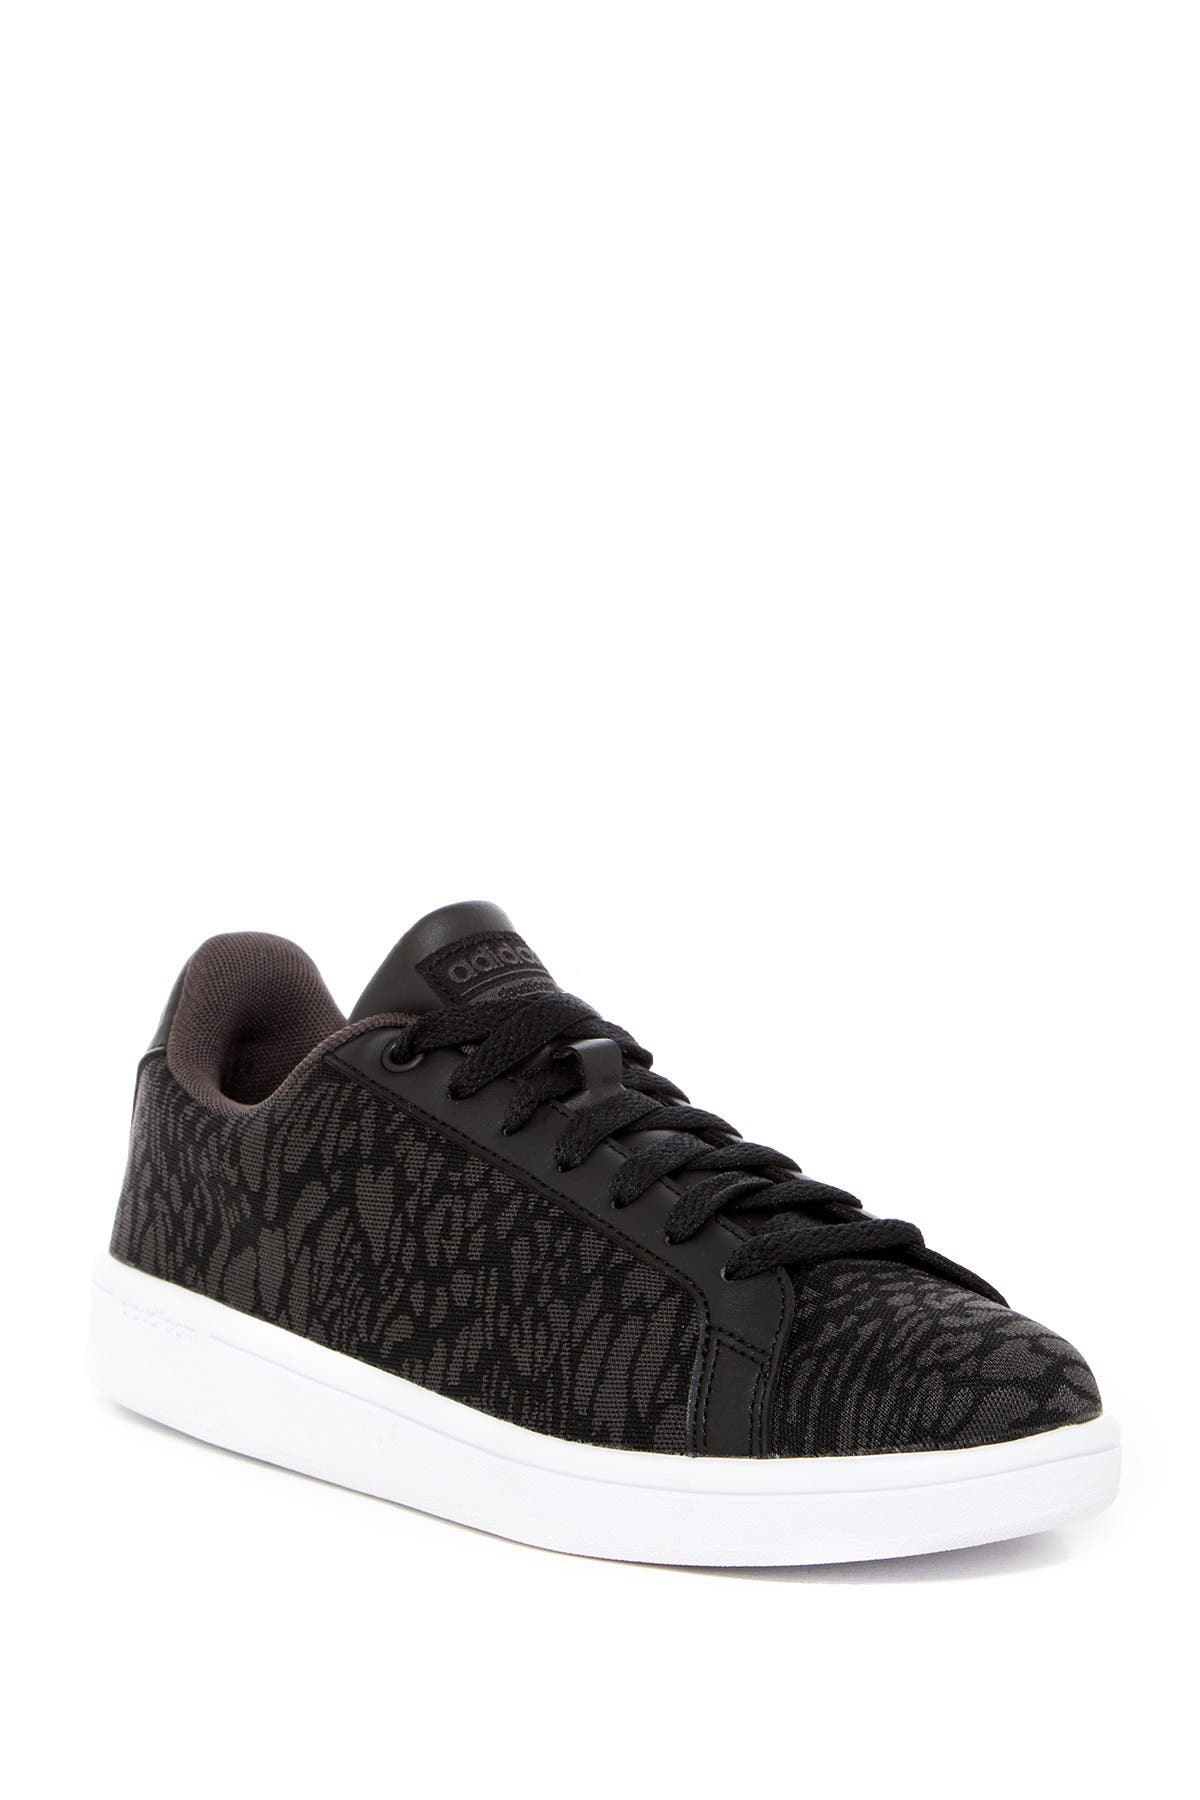 adidas | Cloudfoam Advantage CL Sneaker